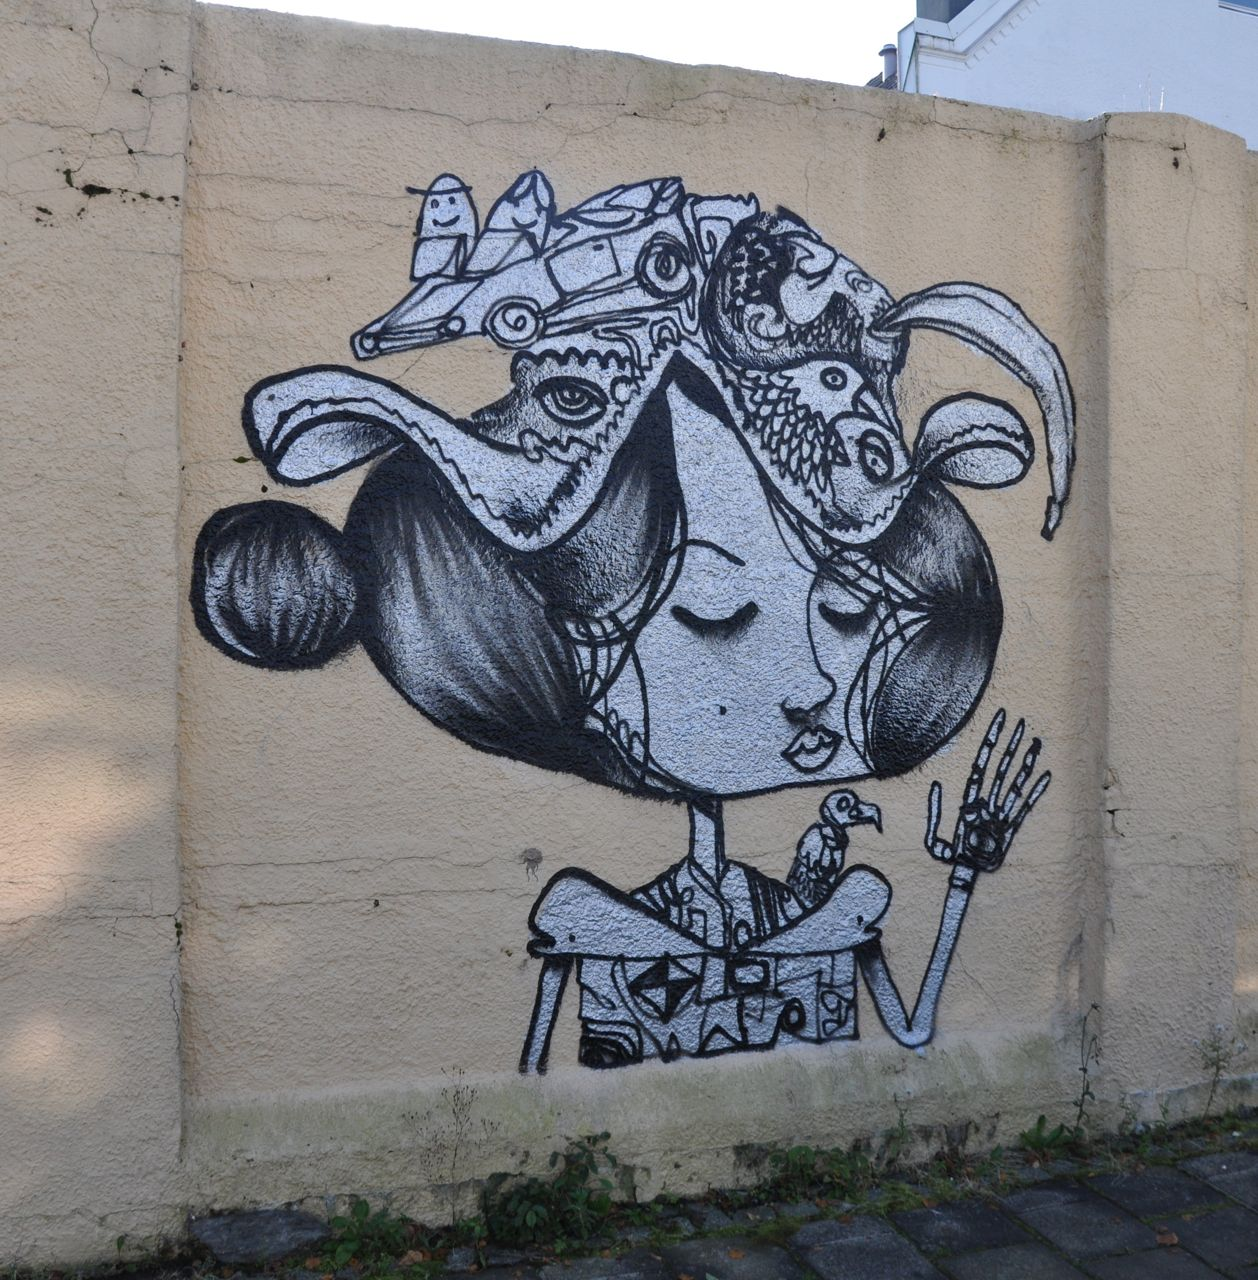 260-2011-david-choe-dvs1-street-art-nuart-festival-25.jpg